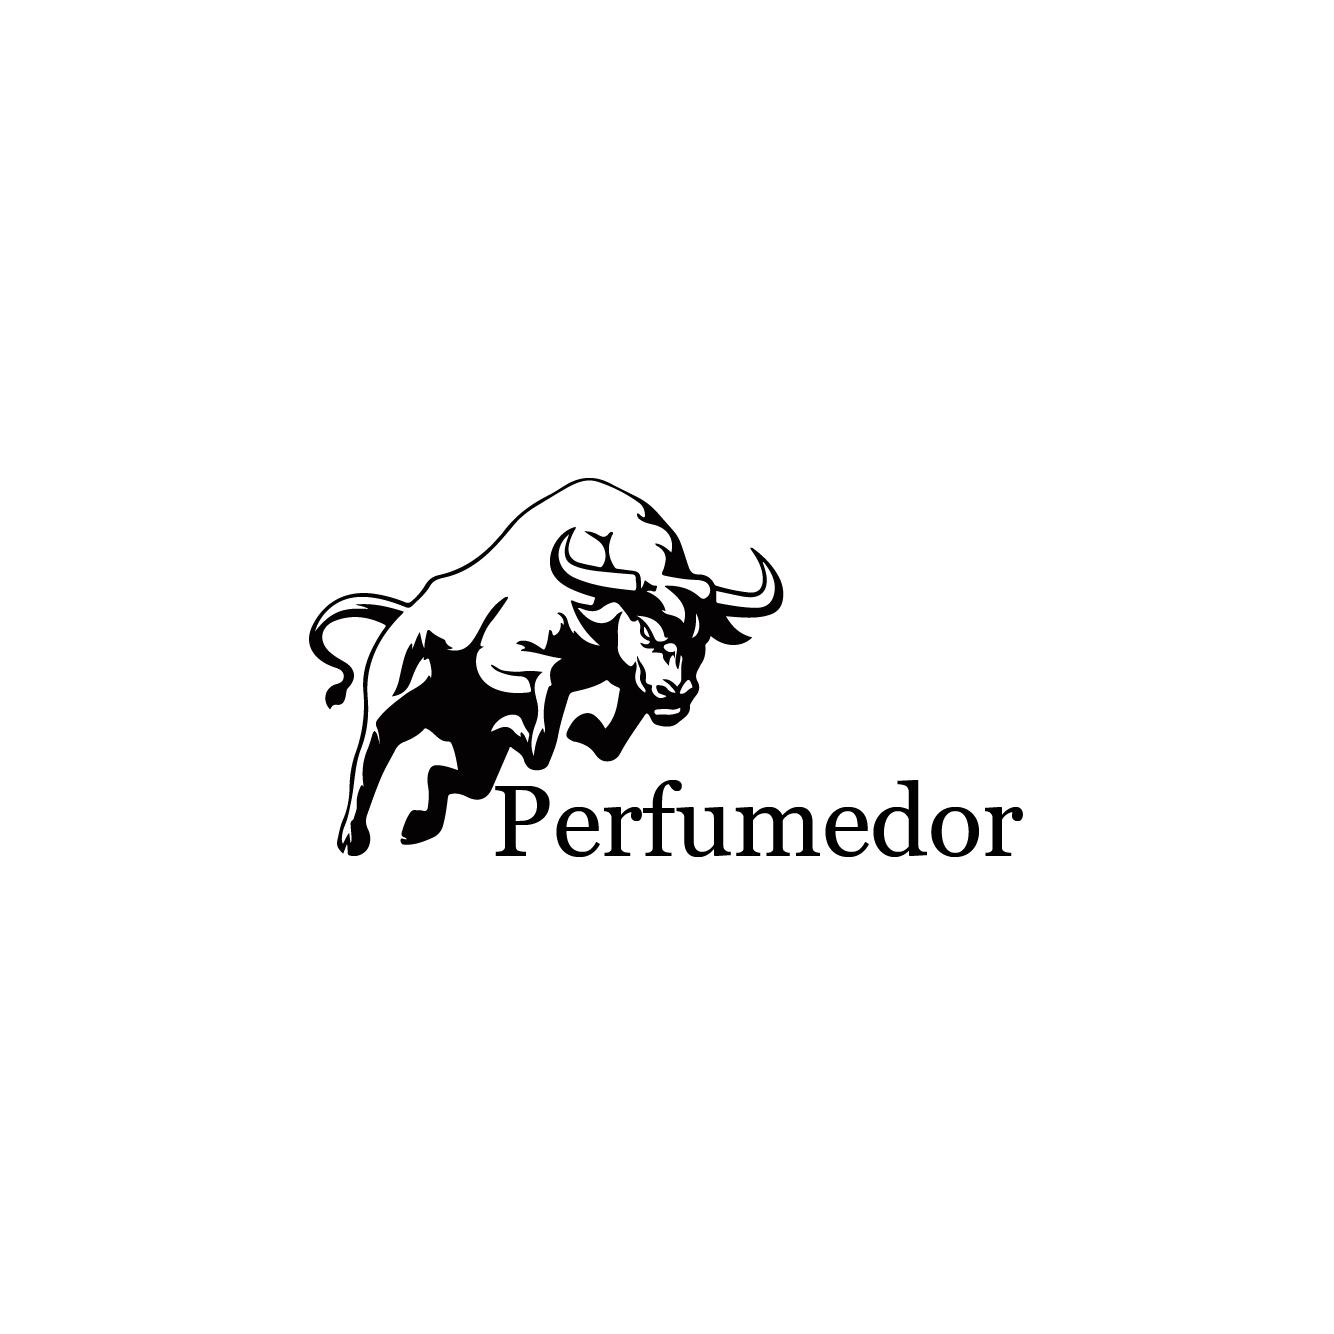 Логотип для интернет-магазина парфюмерии фото f_2875b451aa884a23.jpg